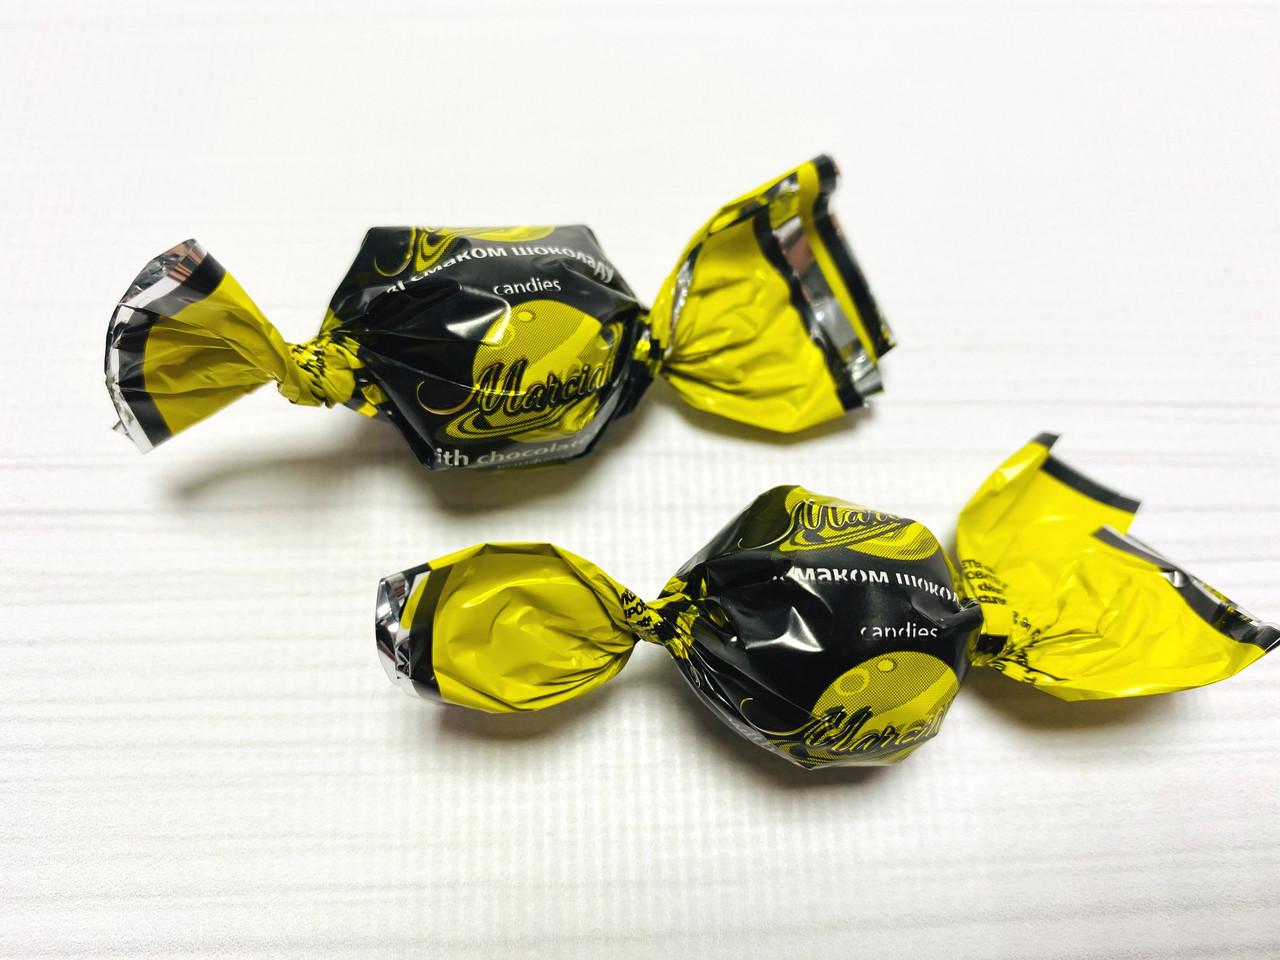 Конфеты Марсиано шоколадница 1,5 кг. ТМ БАЛУ